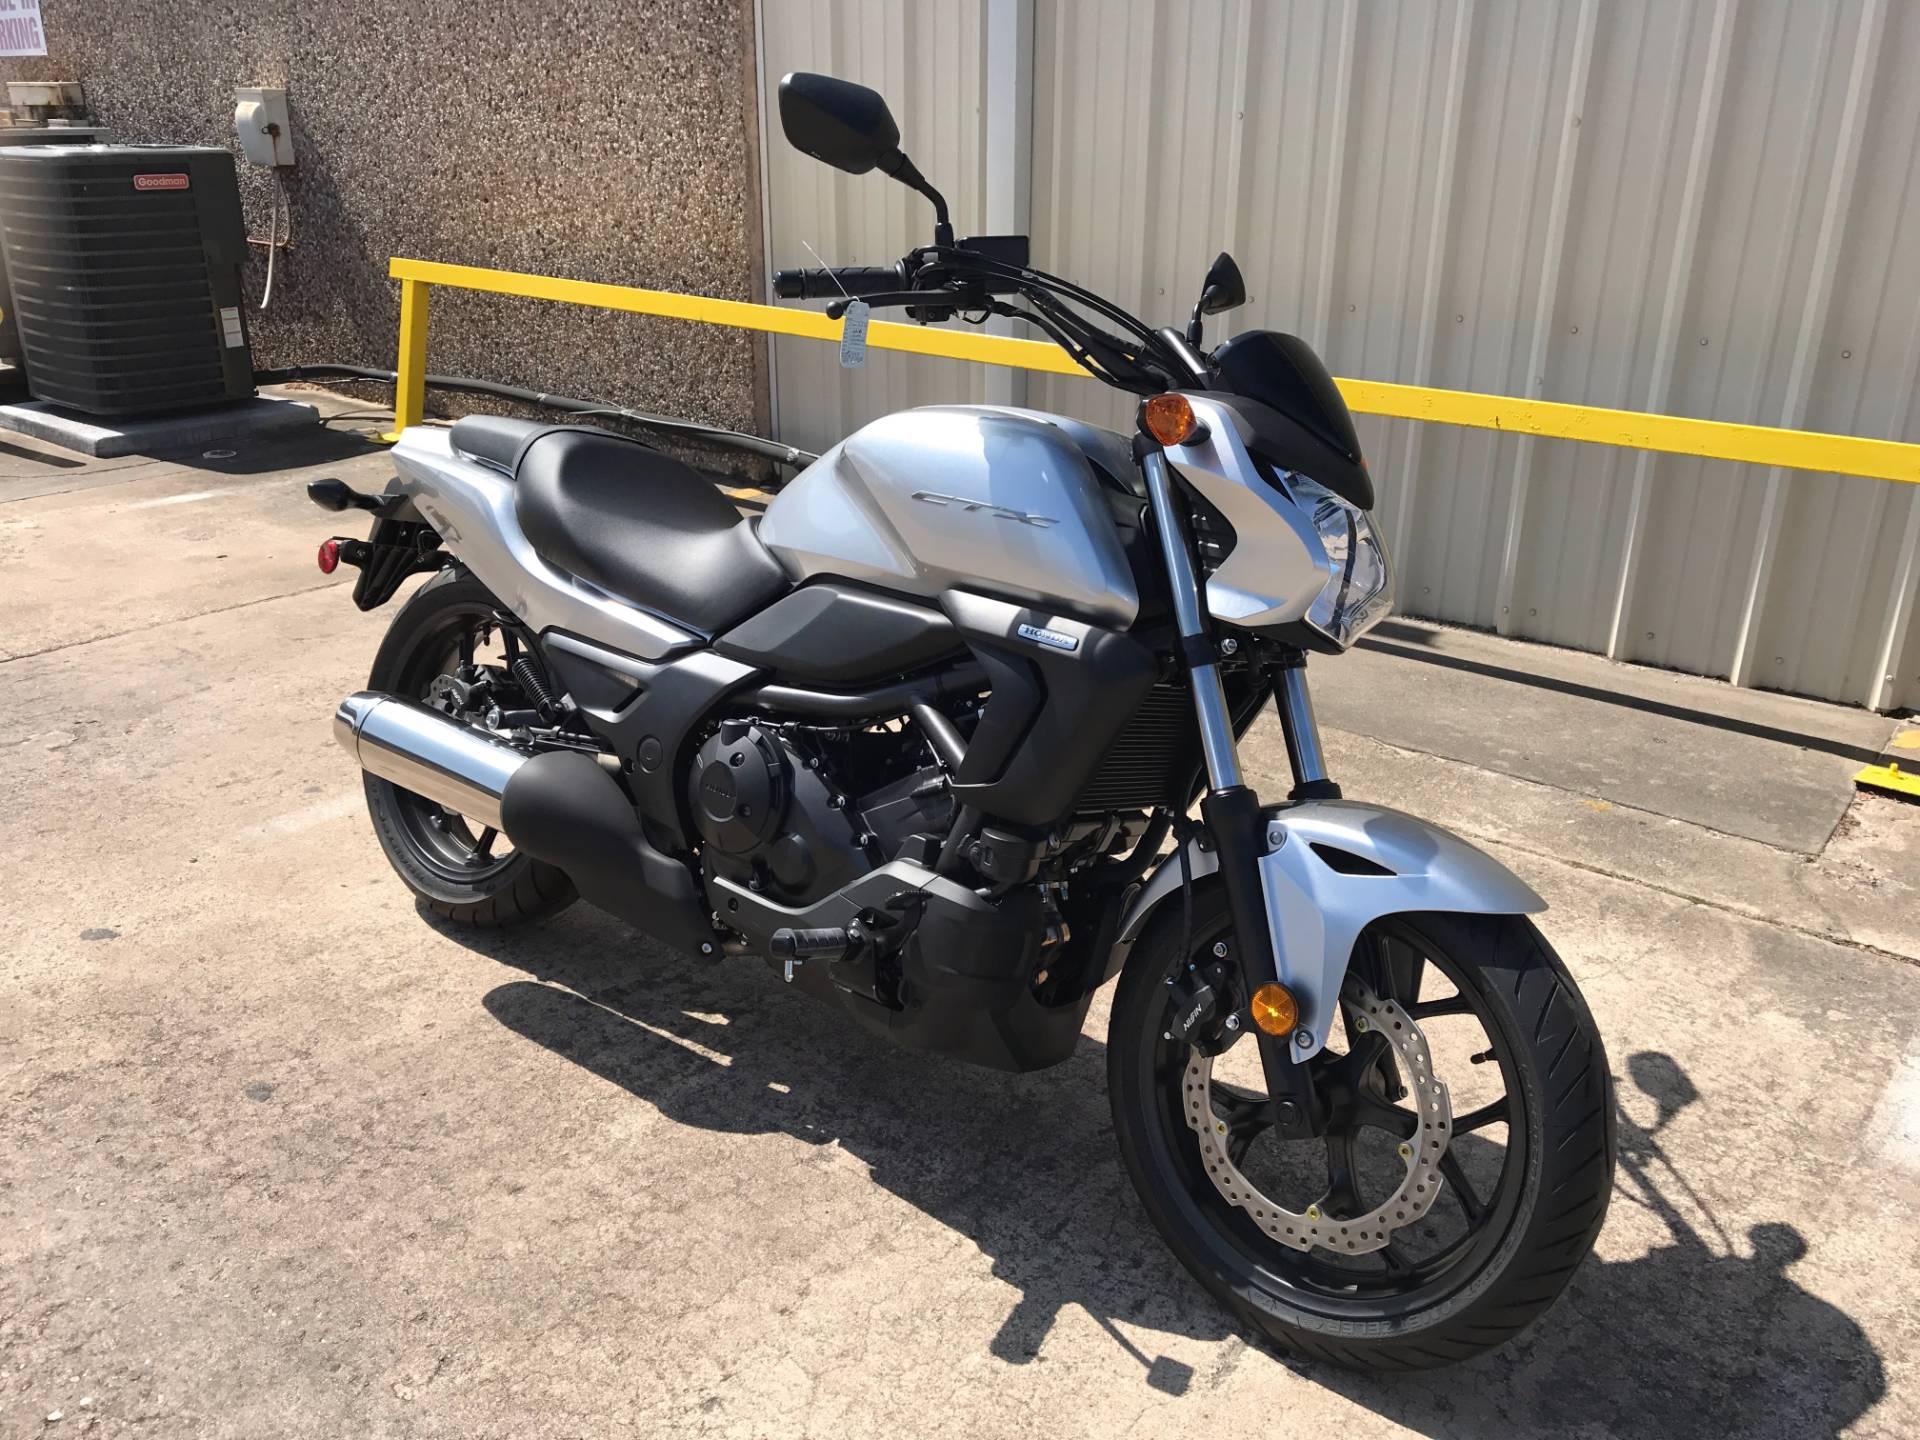 2016 Honda CTX700N in Pasadena, Texas